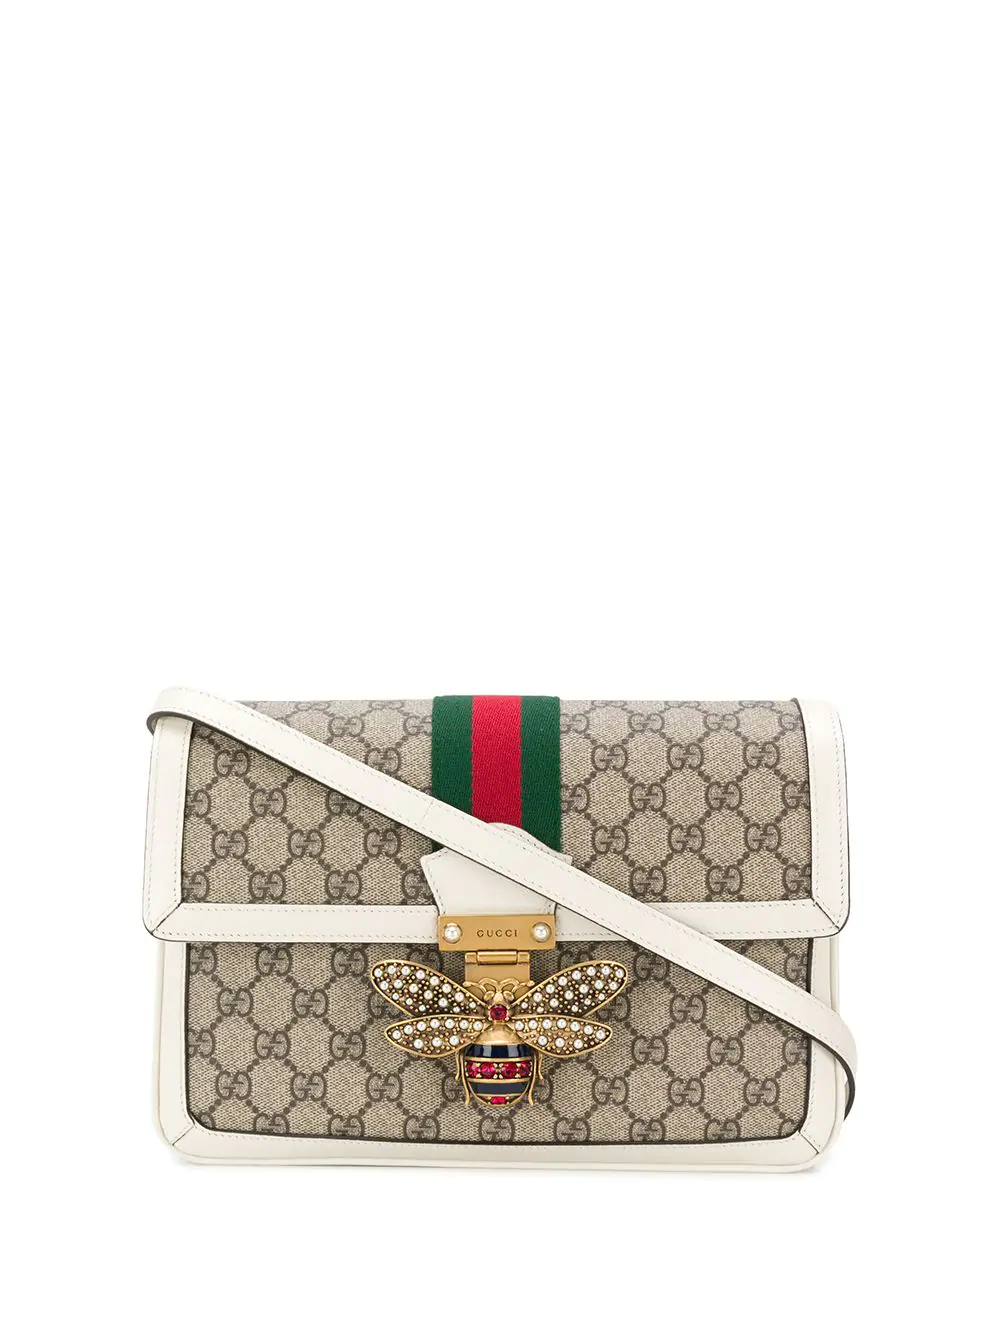 7b1d6bd98a79 Gucci Queen Margaret Medium Leather-Trimmed Printed Coated-Canvas Shoulder  Bag In Beige